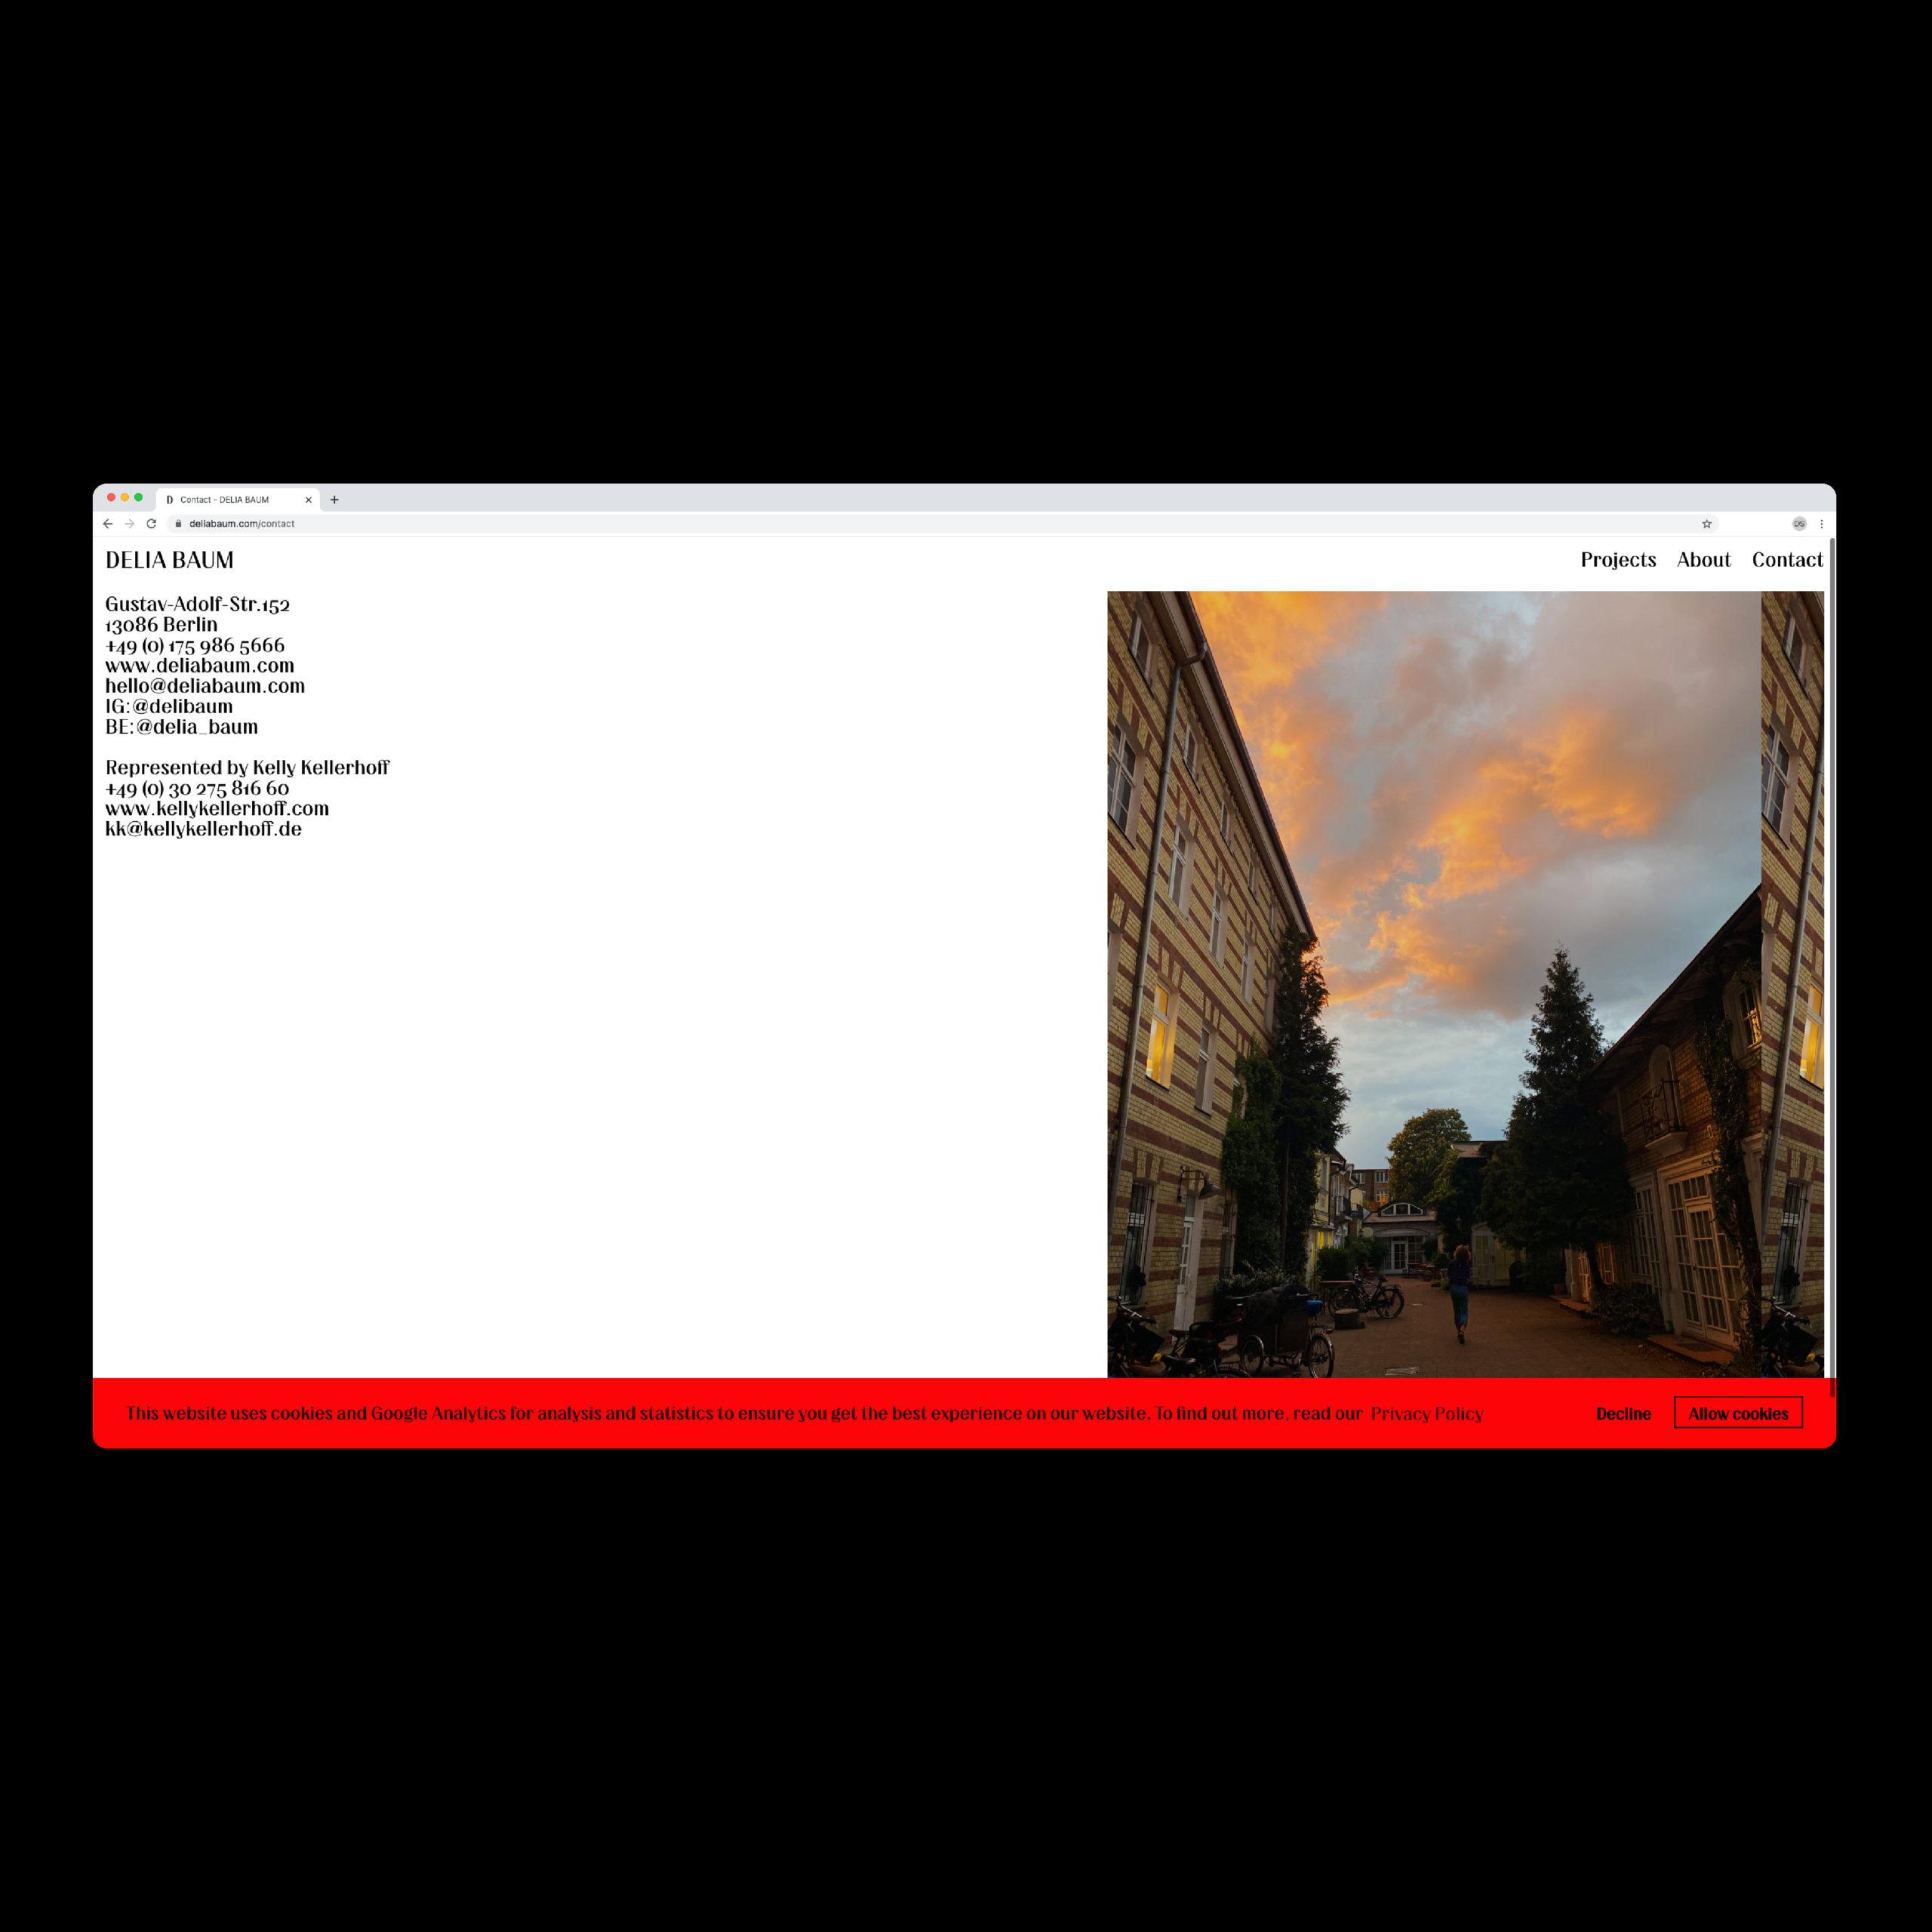 04_Delia-Baum_CI_Daniel-Stuhlpfarrer_Website_8